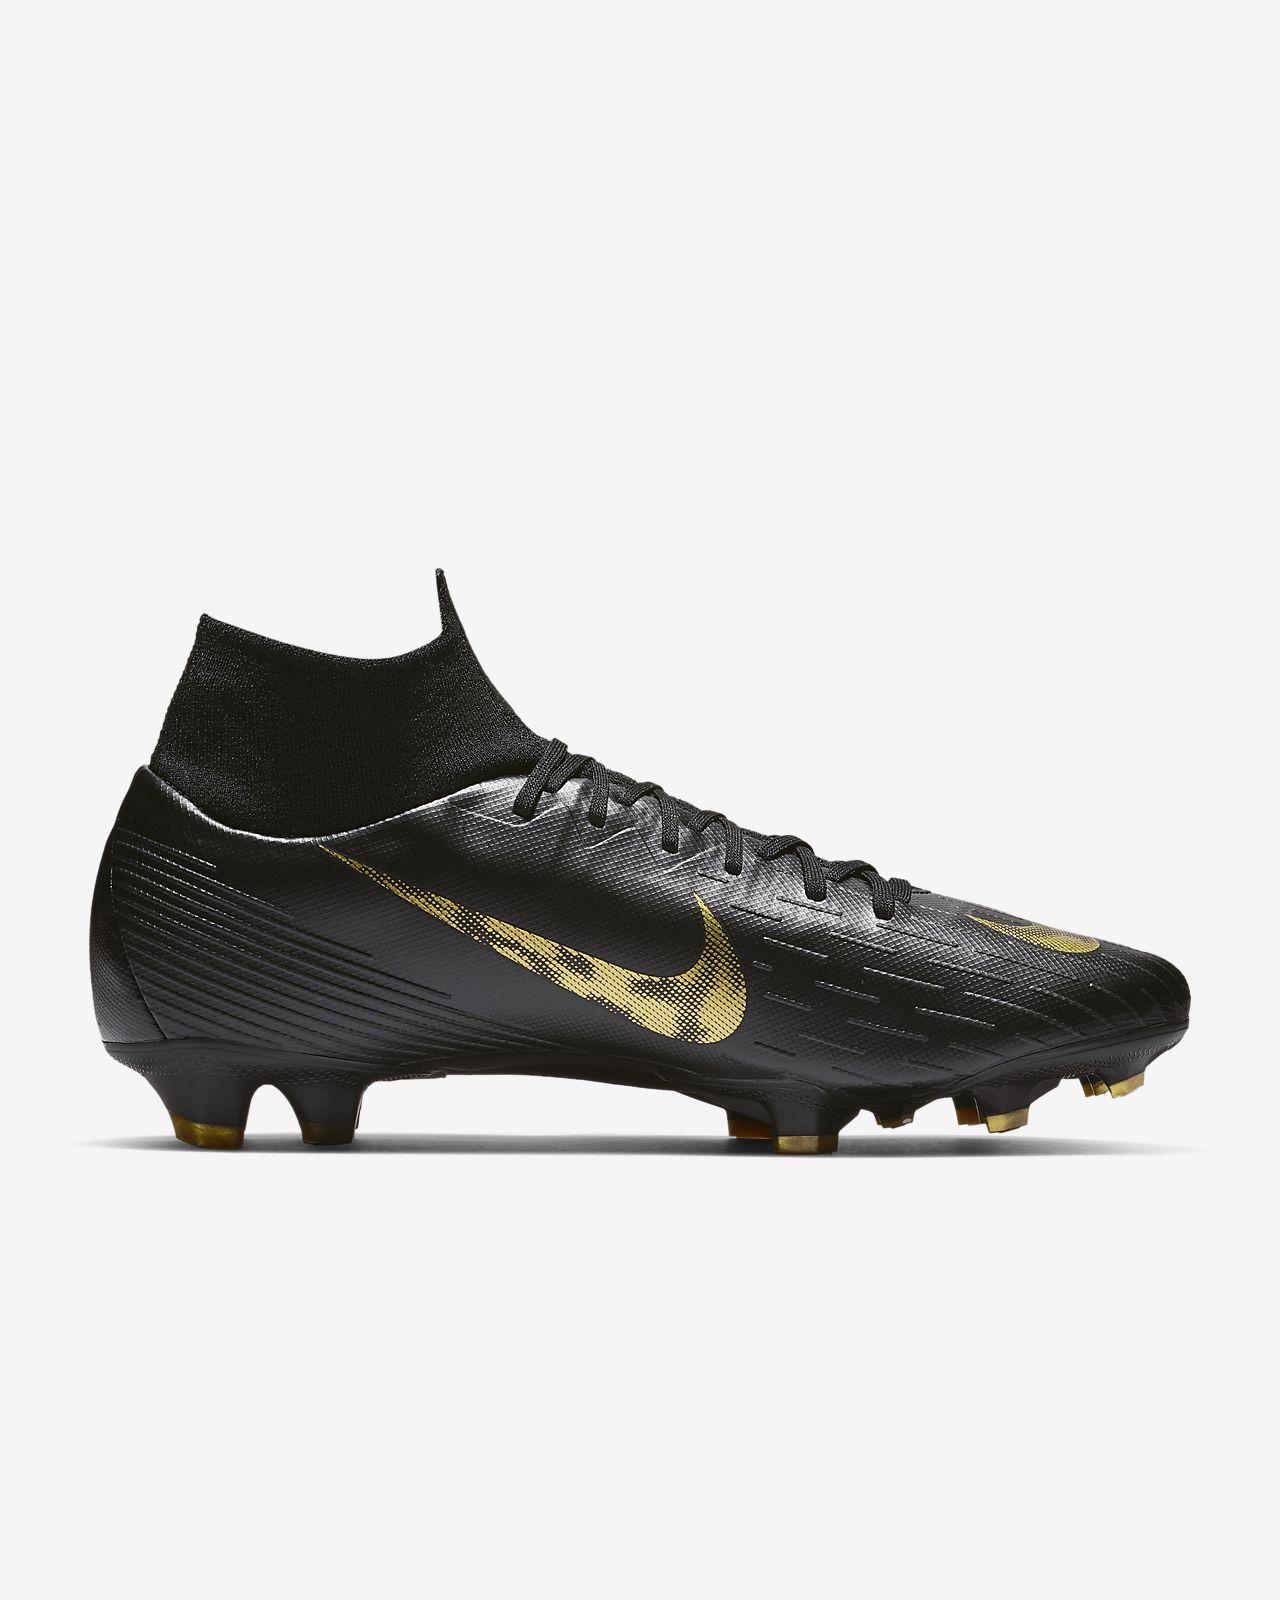 lowest price 5ac92 01e74 ... Nike Superfly 6 Pro FG Botas de fútbol para terreno firme